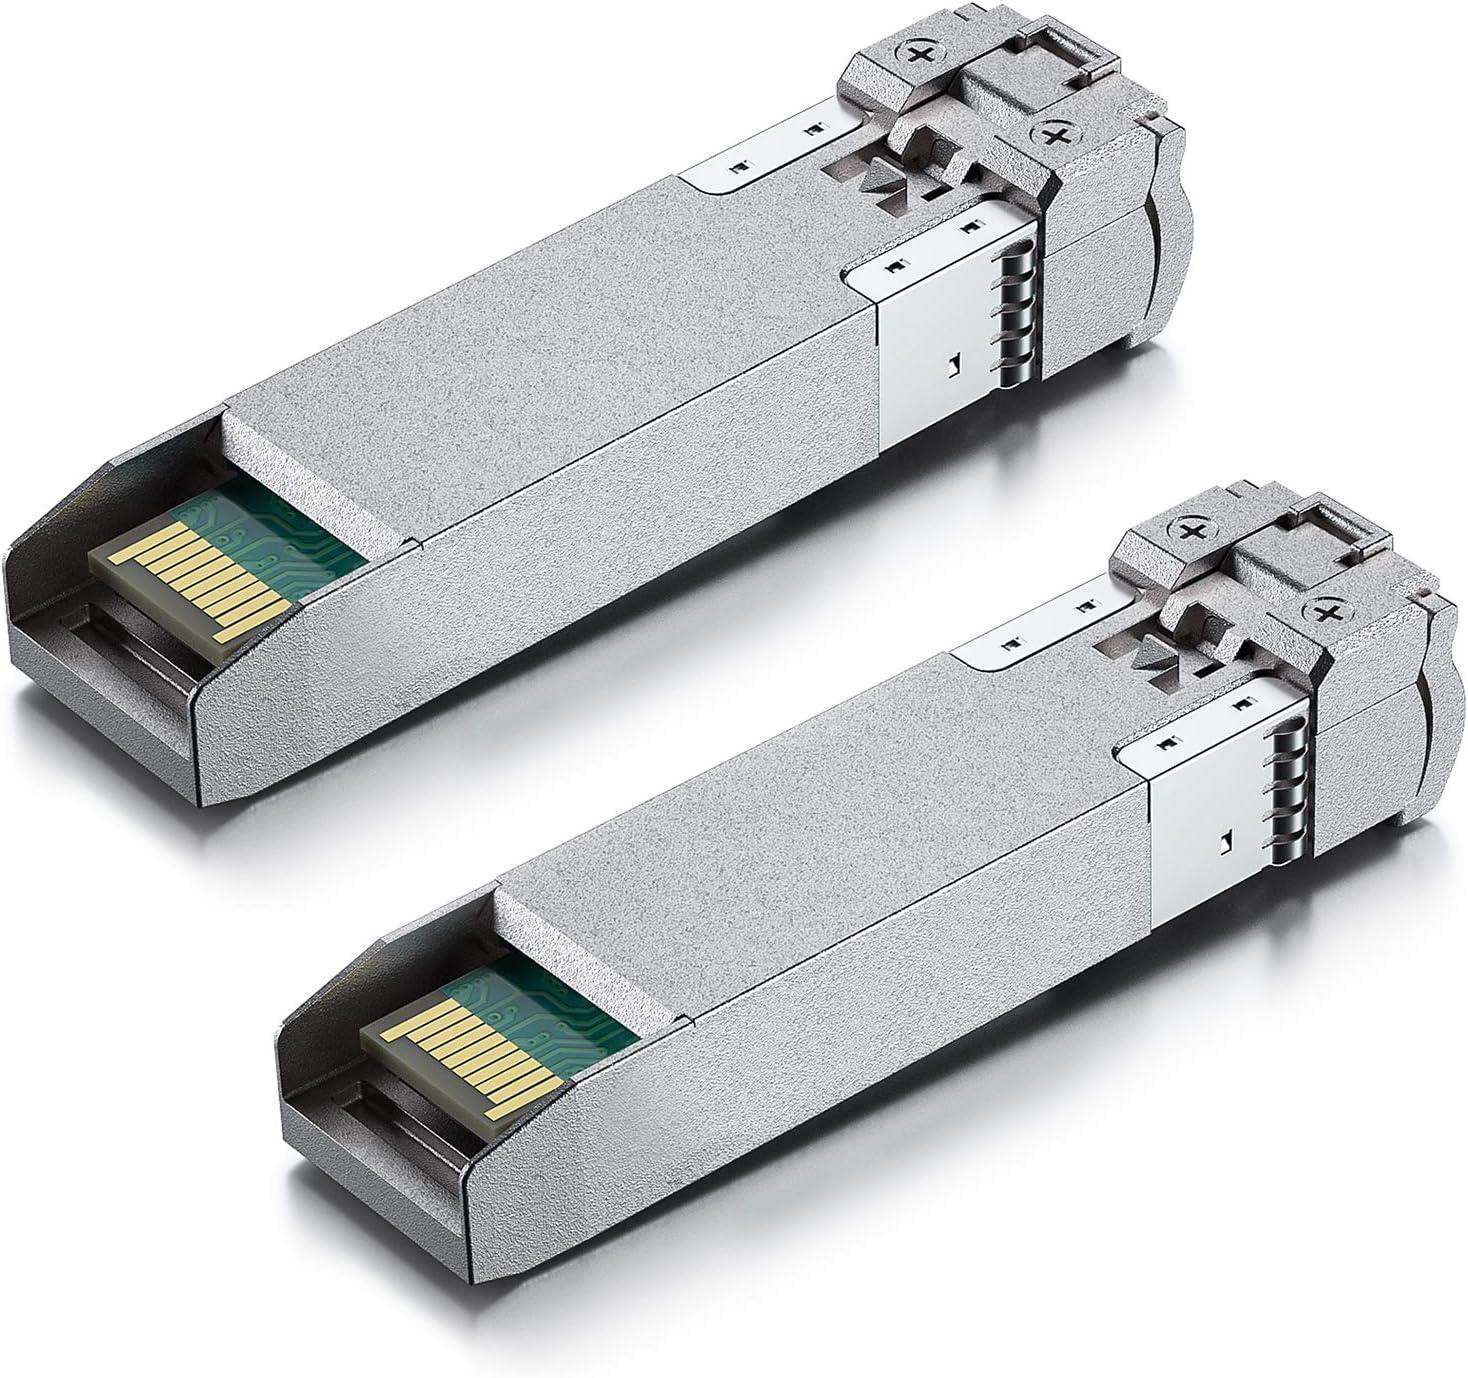 a Pair of 10G SFP+ Bidi Transceiver, 10GBase-BIDI 1270nm/1330nm SMF, up to 40km, Compatible with Cisco SFP-10G-BX40D-I/SFP-10G-BX40U-I, Ubiquiti UniFi, Mikrotik, D-Link, Supermicro, Netgear and More